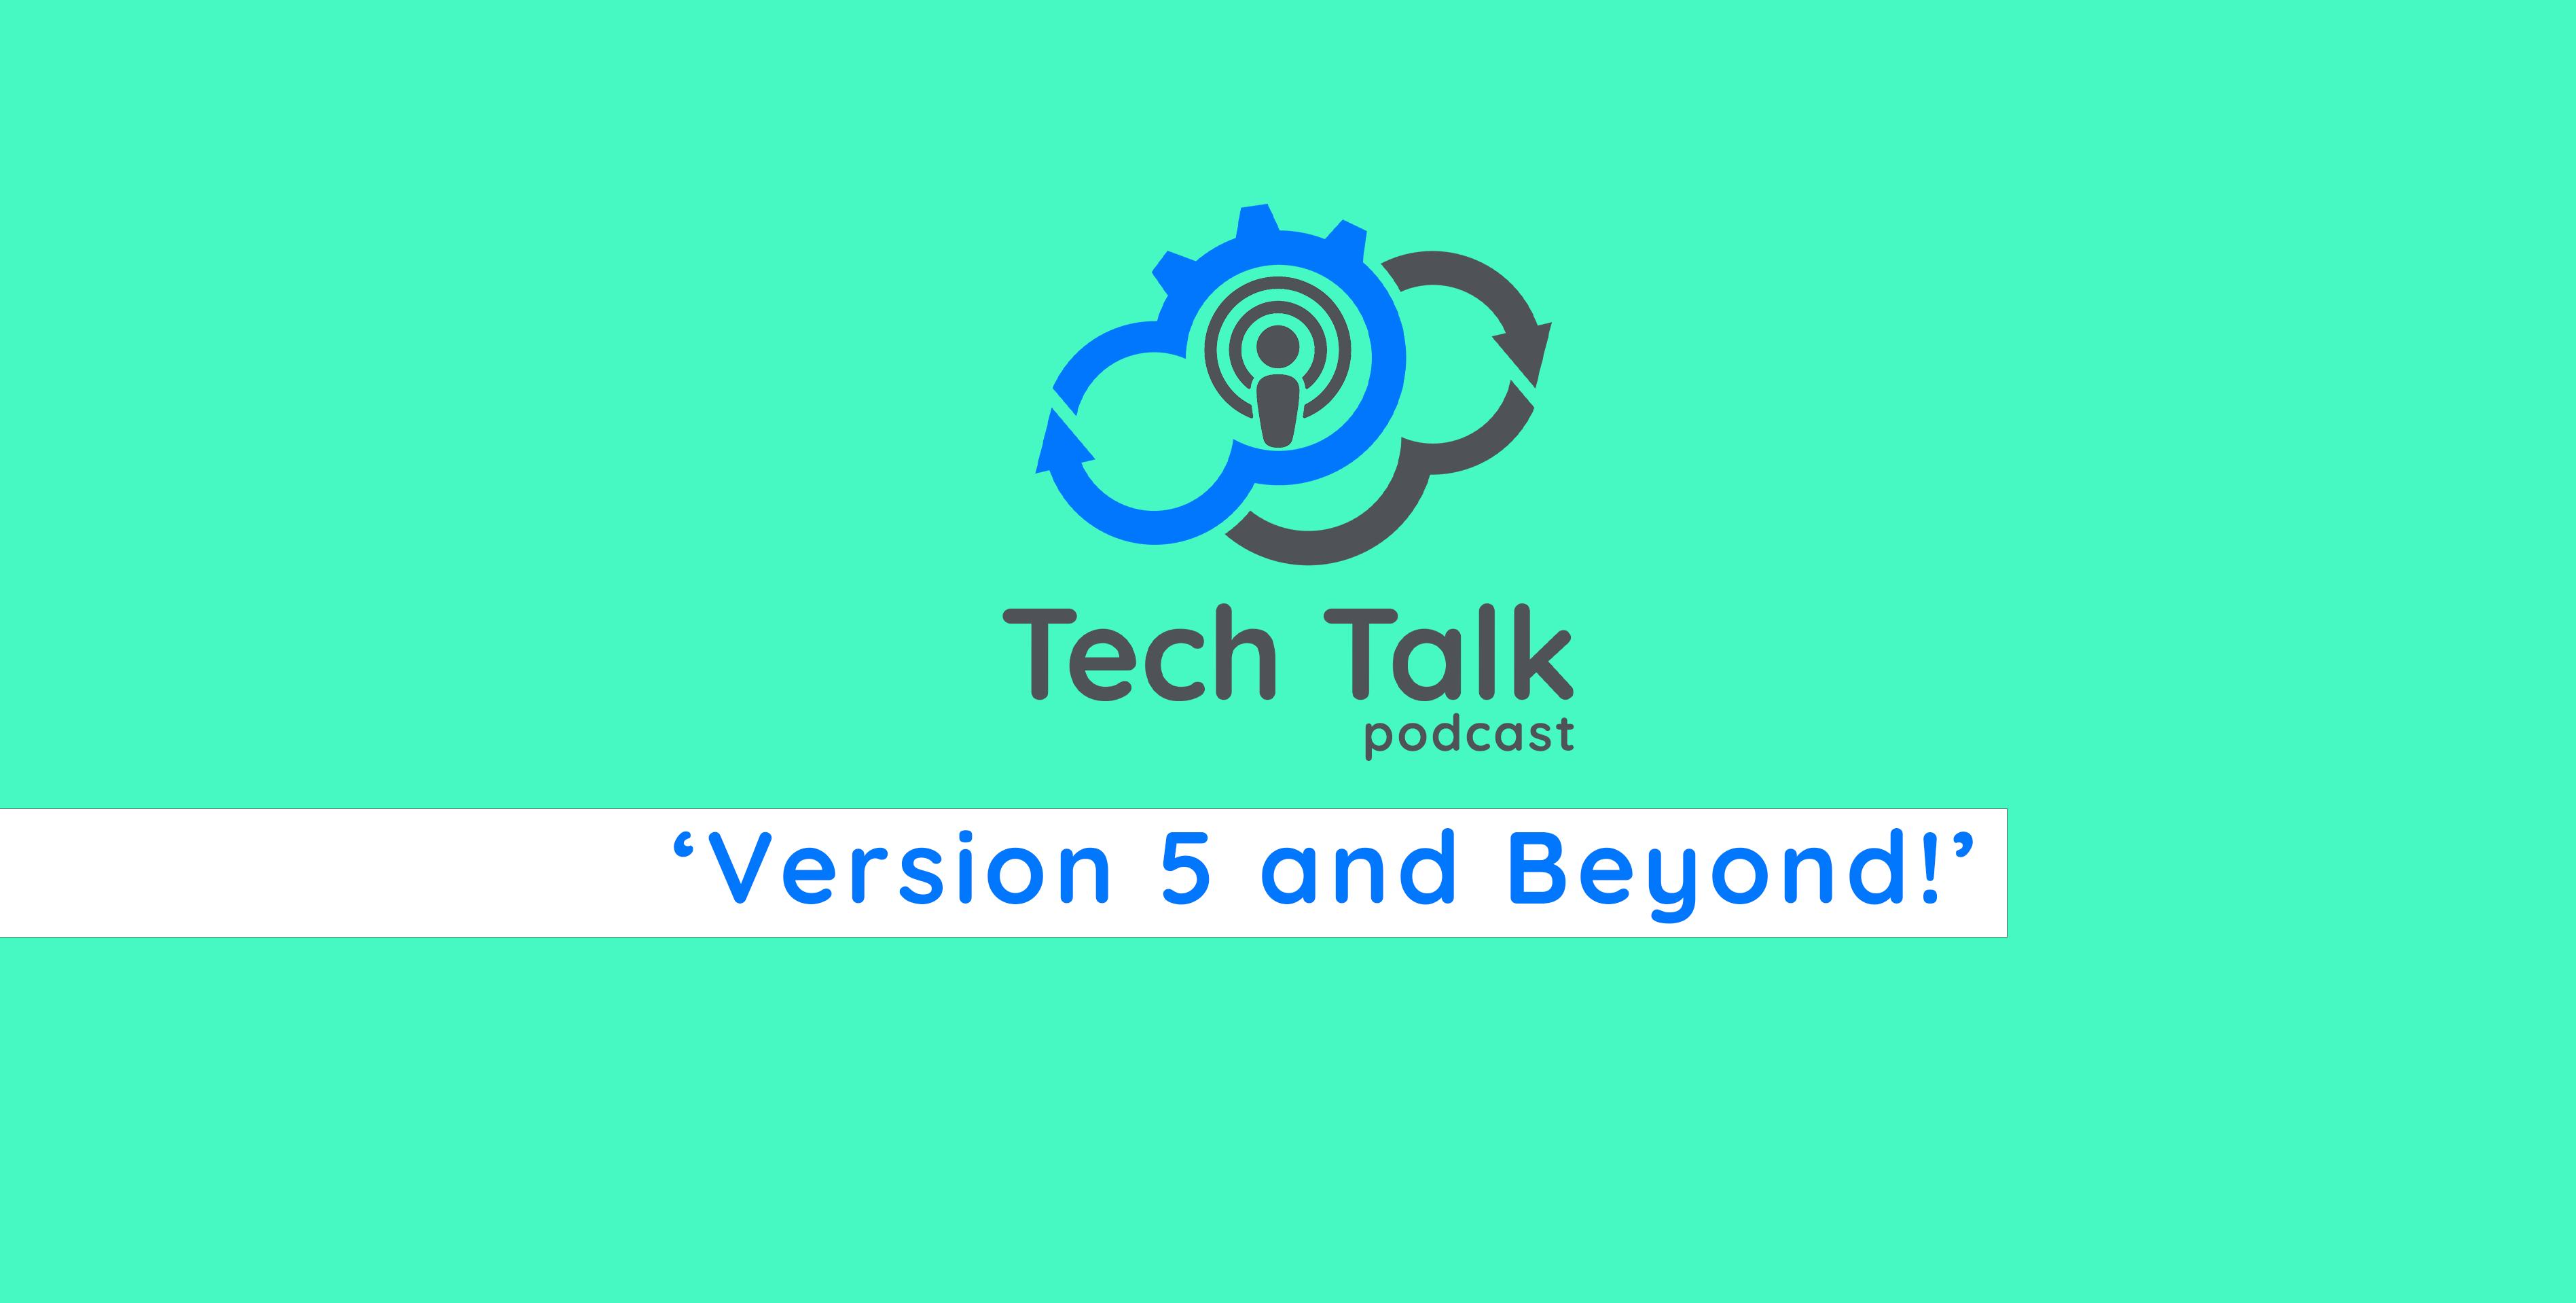 Podcast Cloudify vision